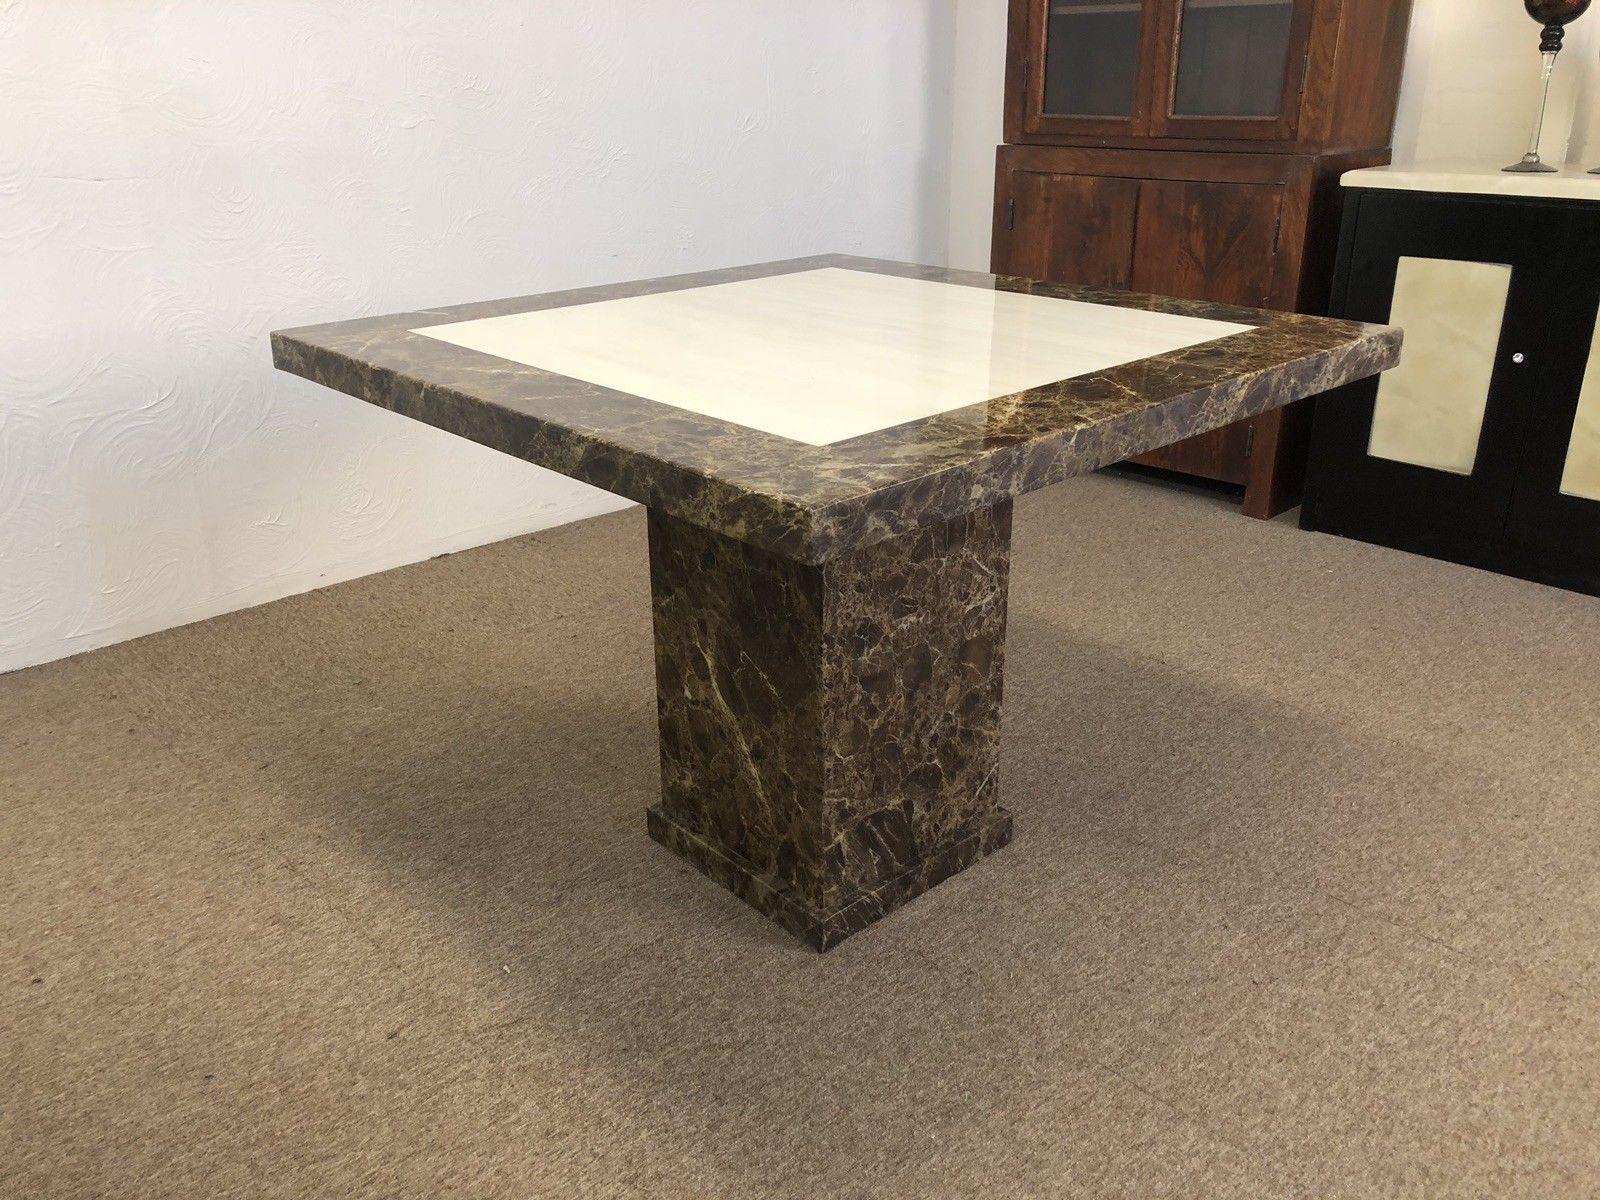 Monaco Square Marble Table 100cm2 Designer Marble